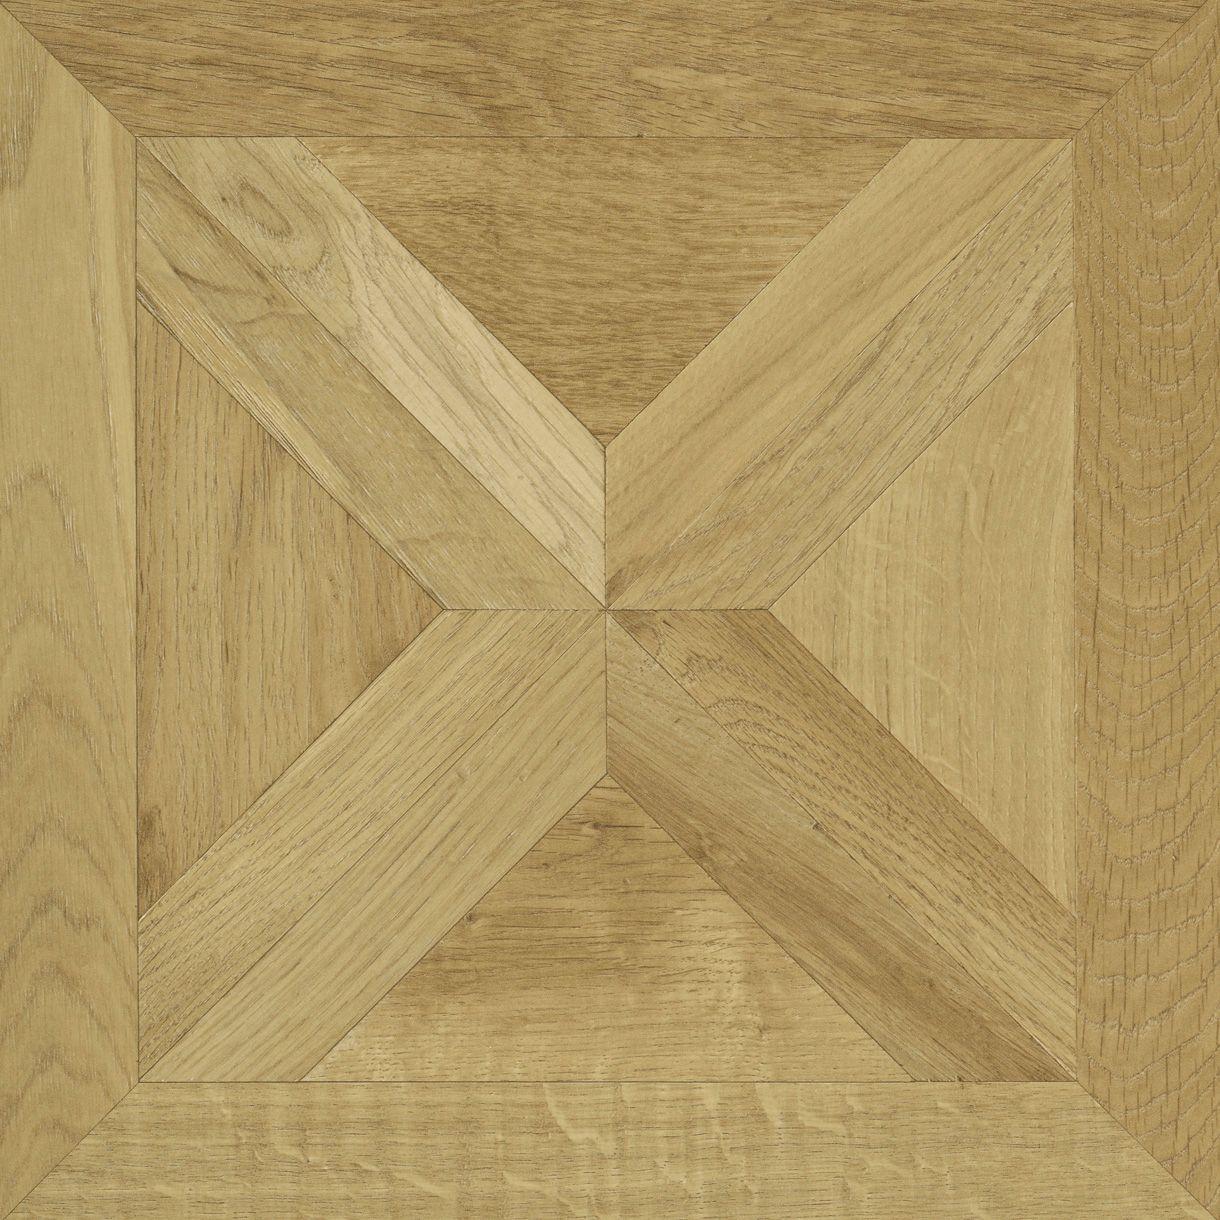 Staccato Natural Oak Parquet Effect Laminate Flooring 0